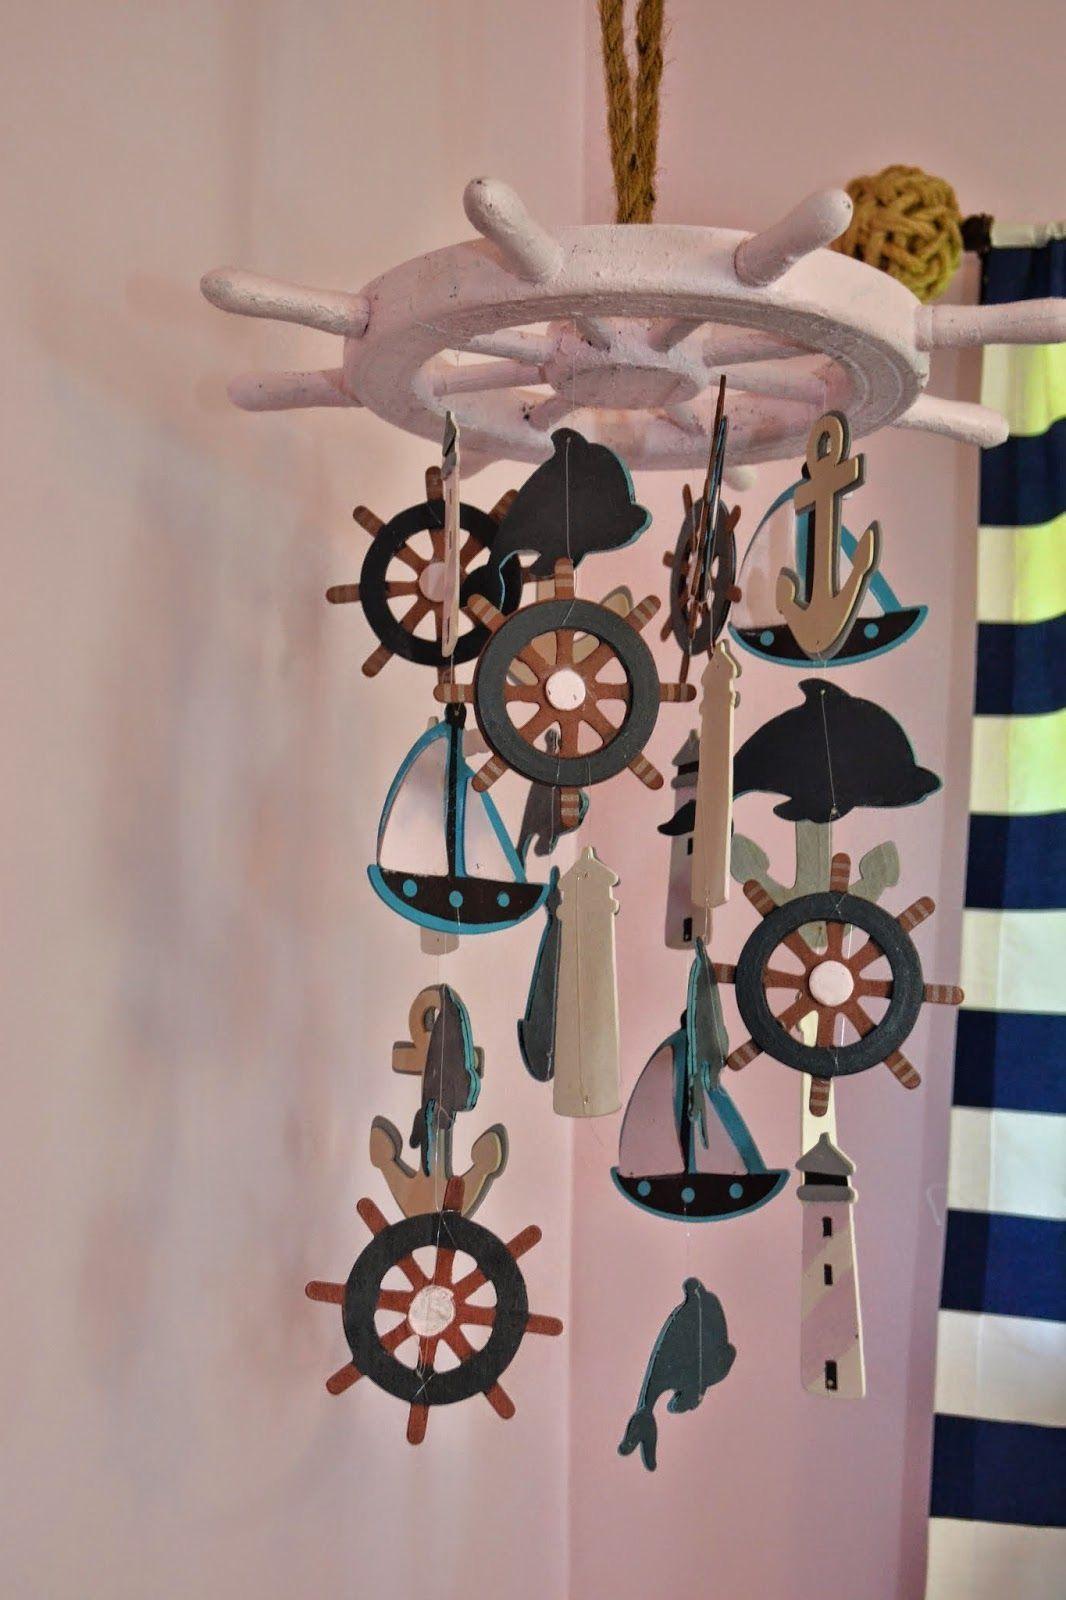 Pin von Shanna Bolton auf Grayson Thomas | Pinterest | Babyzimmer ...